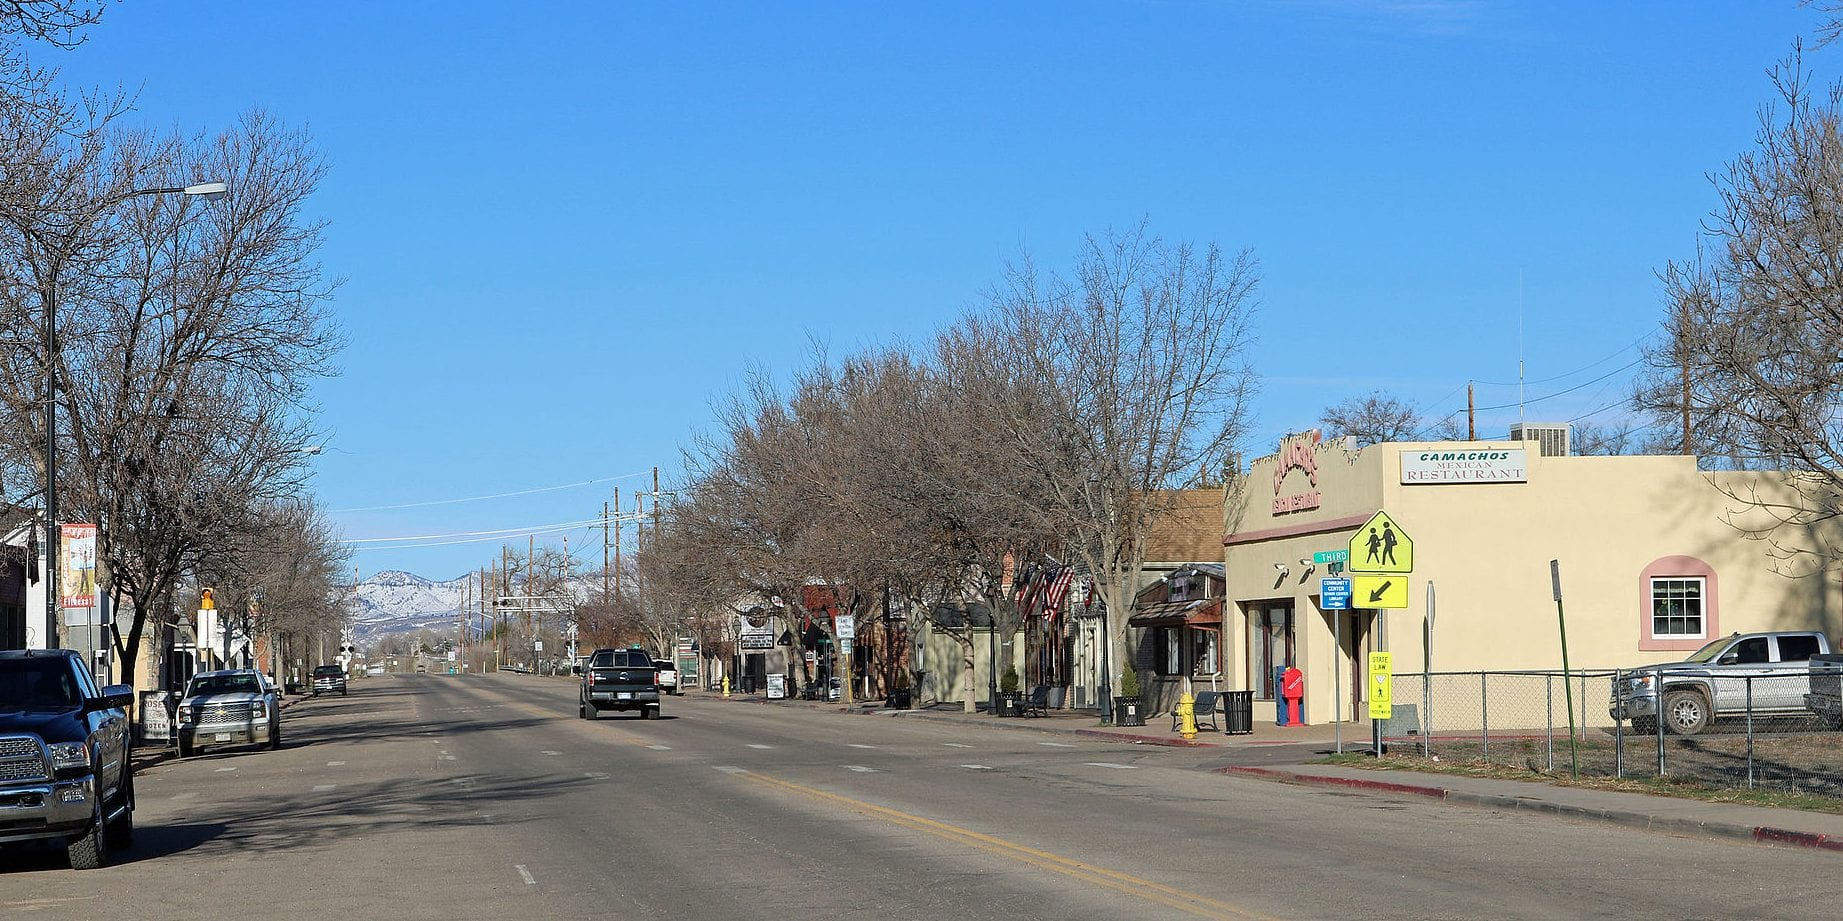 image of Wellington Colorado